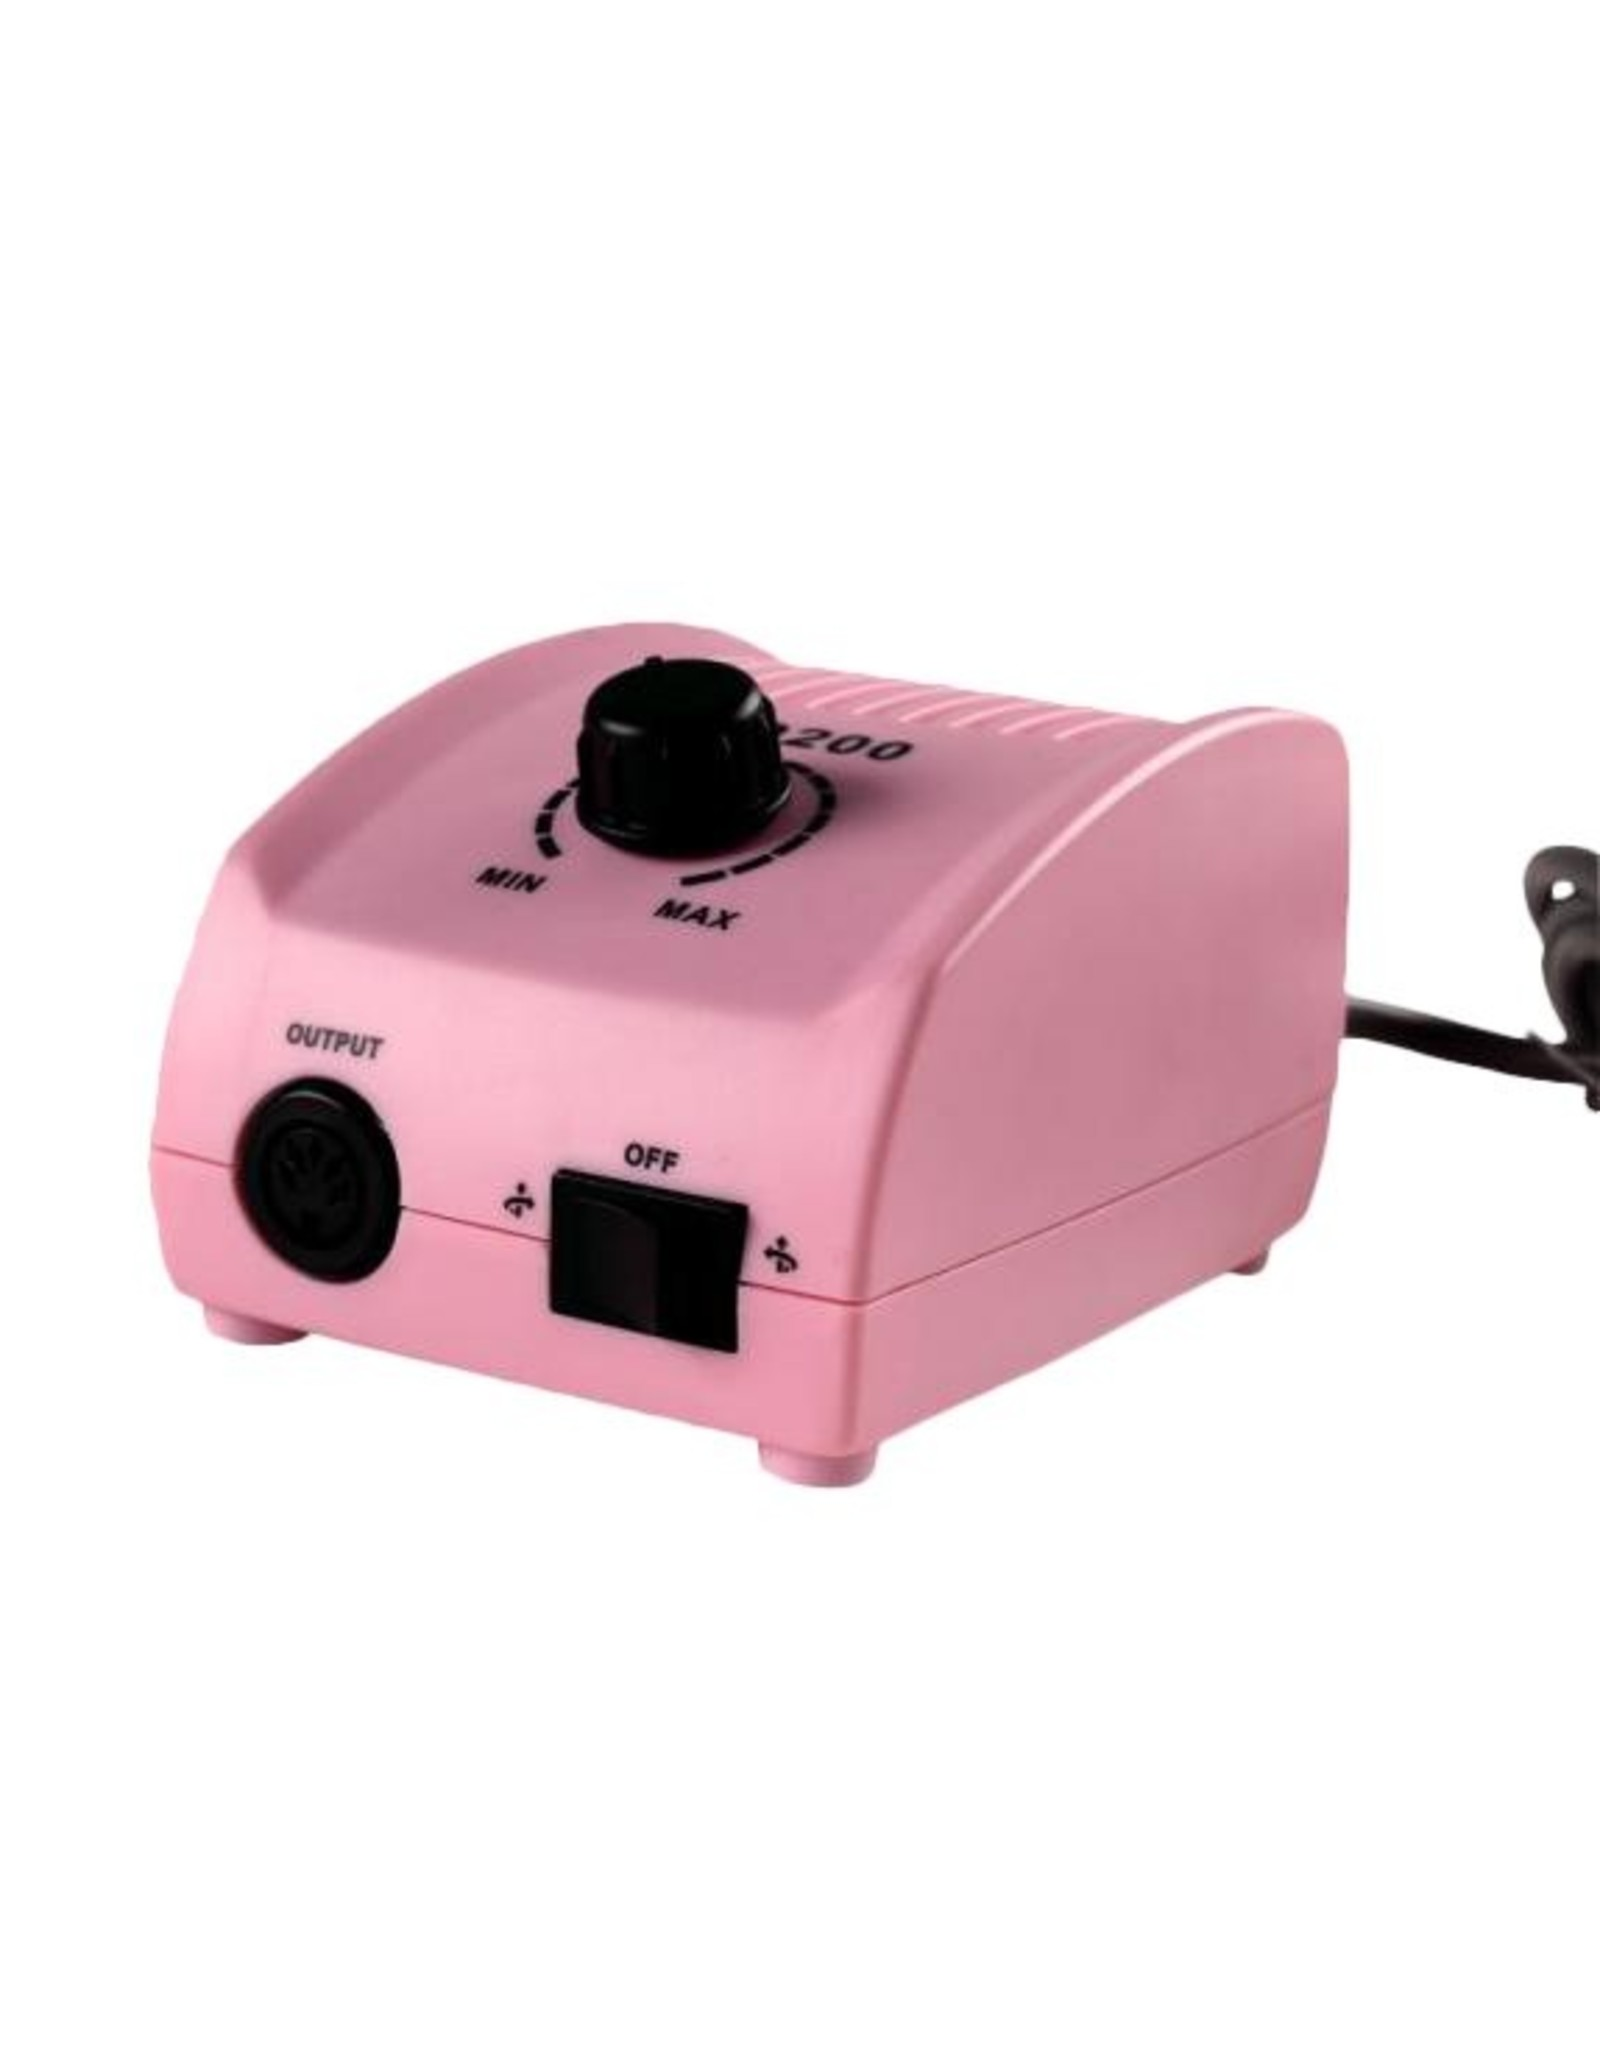 Mega Beauty Shop® Nagelfrees JD200 Roze Originele MBS® + Freesset 30-delig!